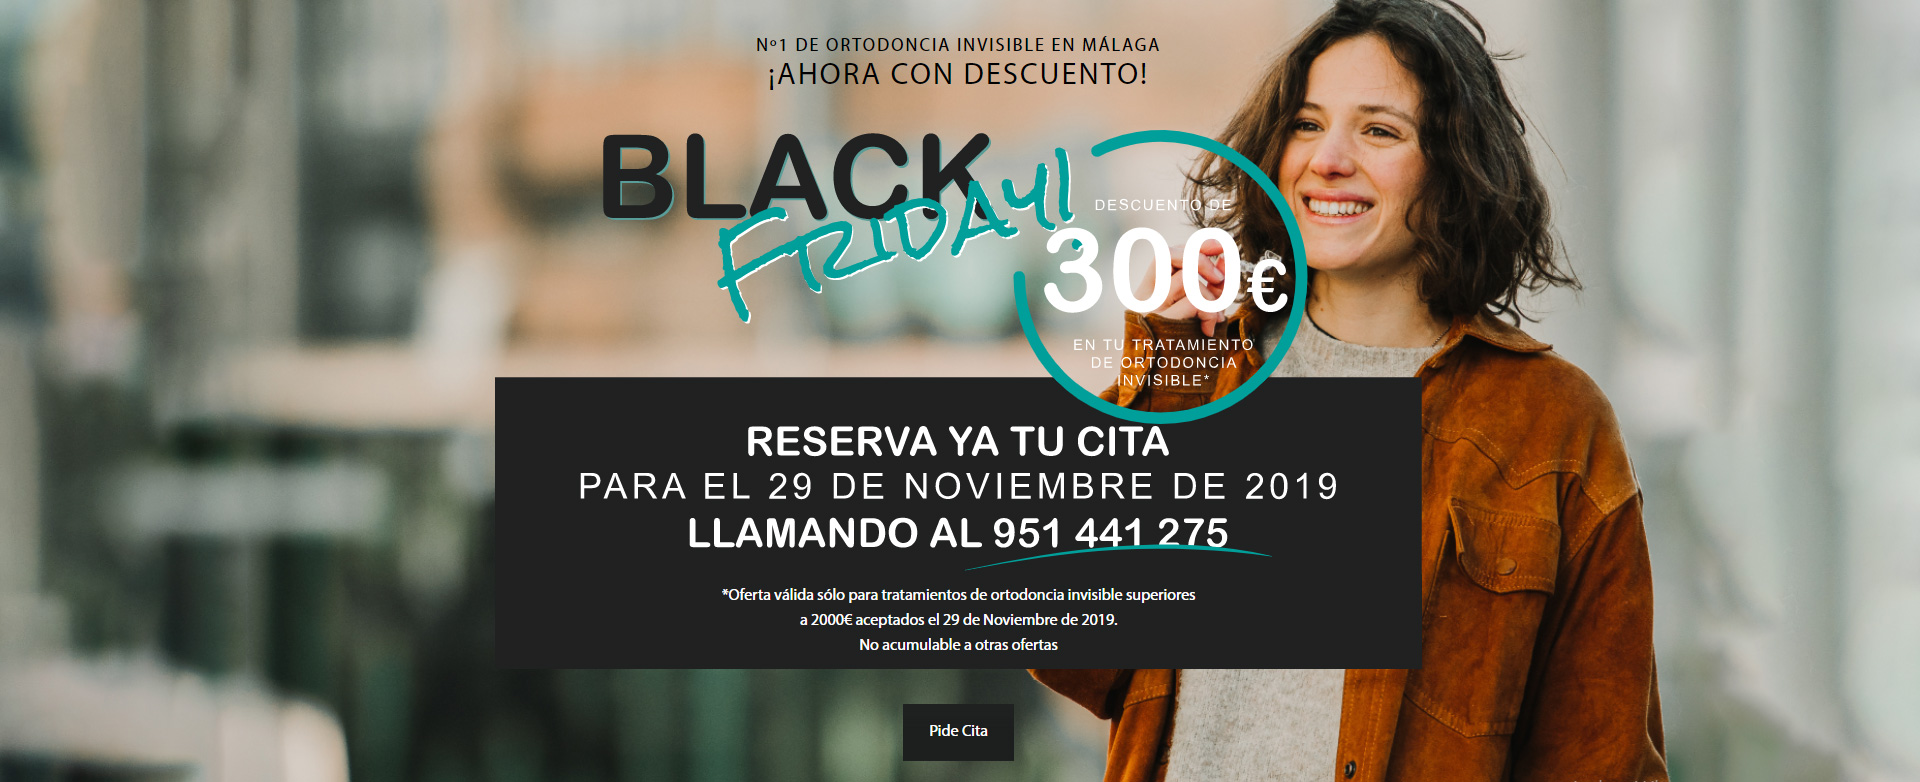 Ortodoncia Black Friday